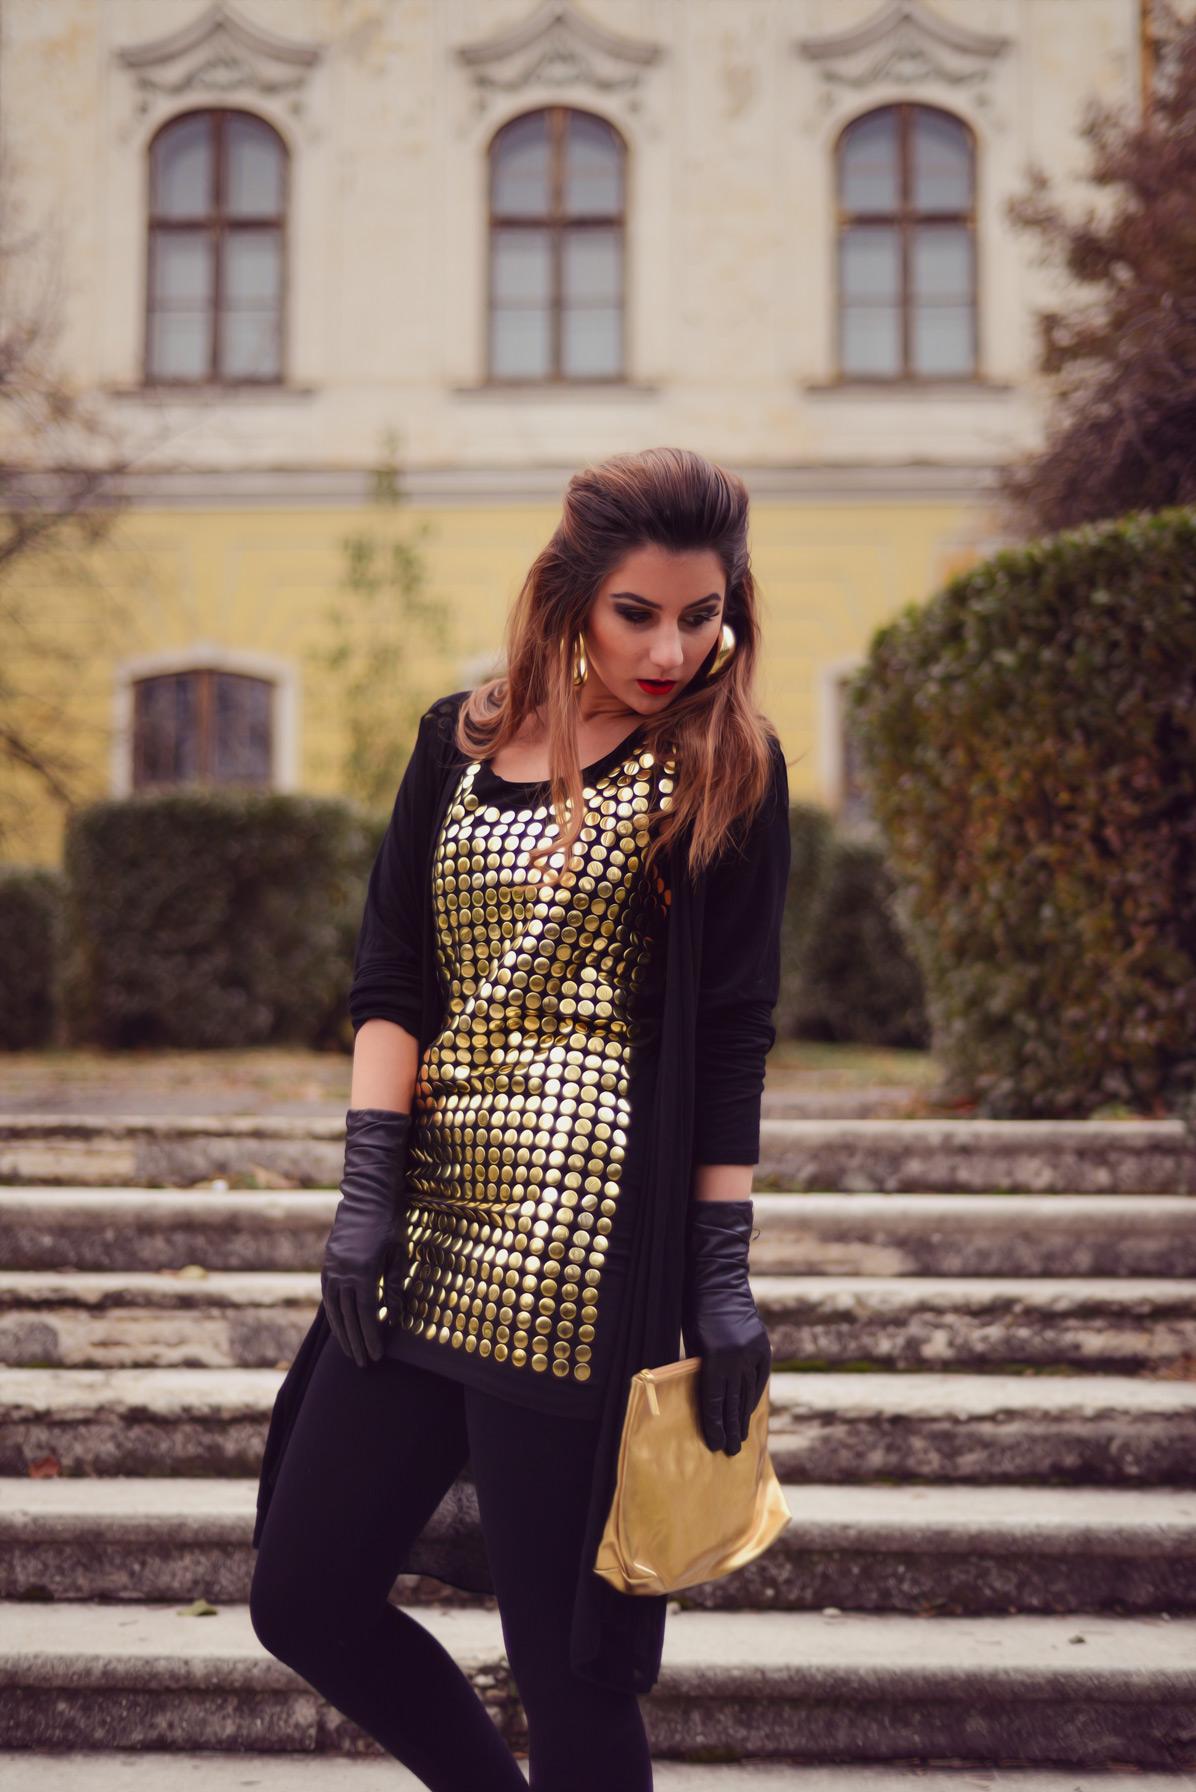 rochie statement de revelion iulia andrei fashion blog tinuta aurie noaptea dintre ani 2014